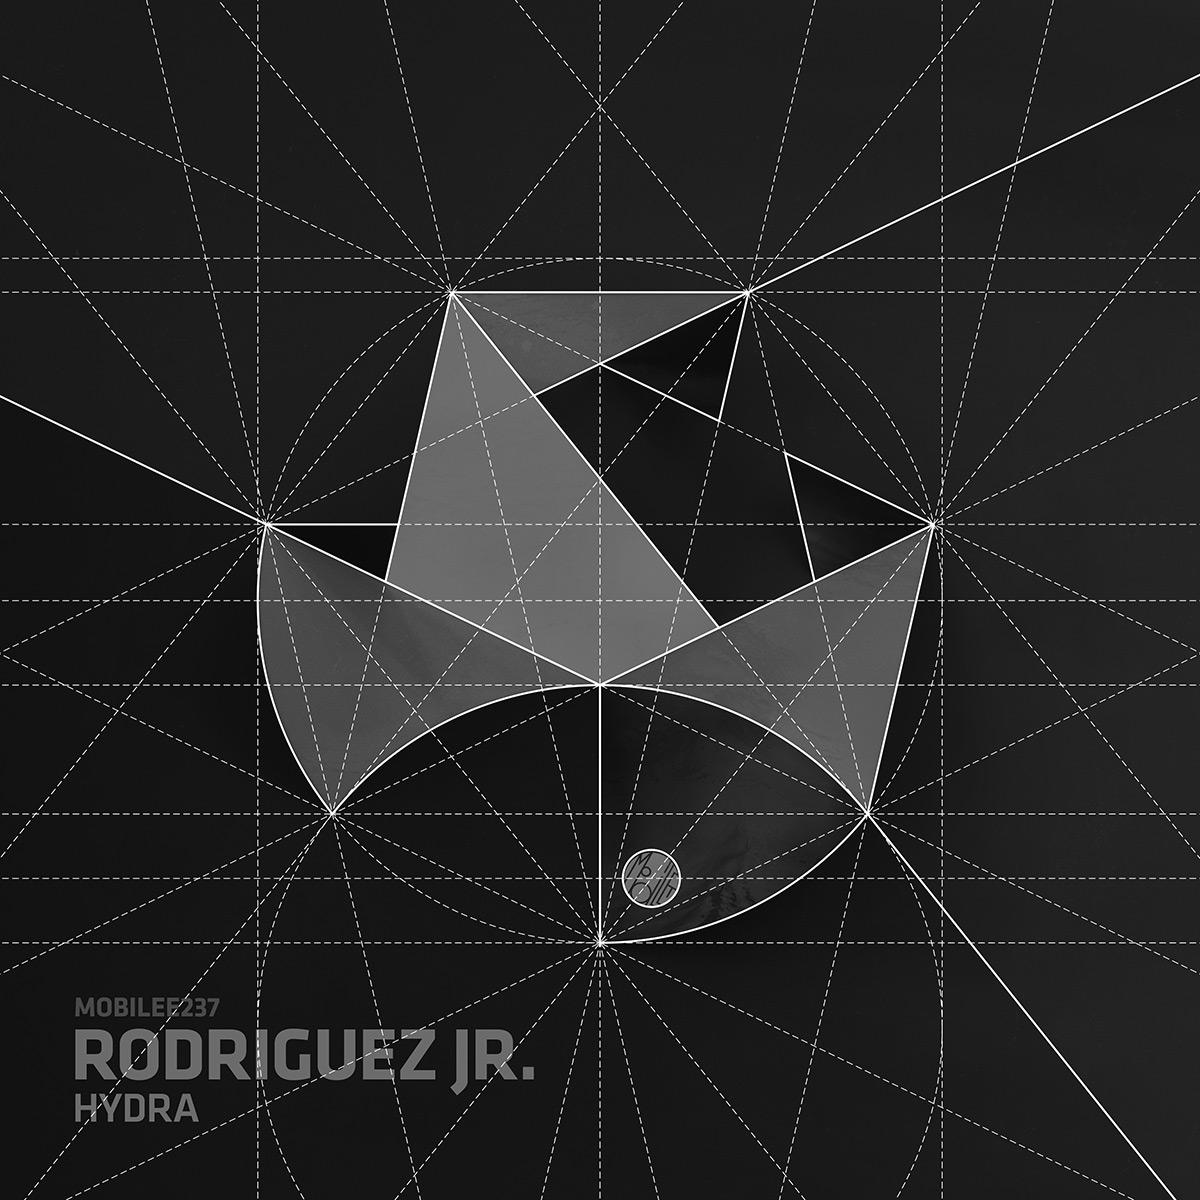 Mobilee237_RodriguezJr_Hydra_construction_small